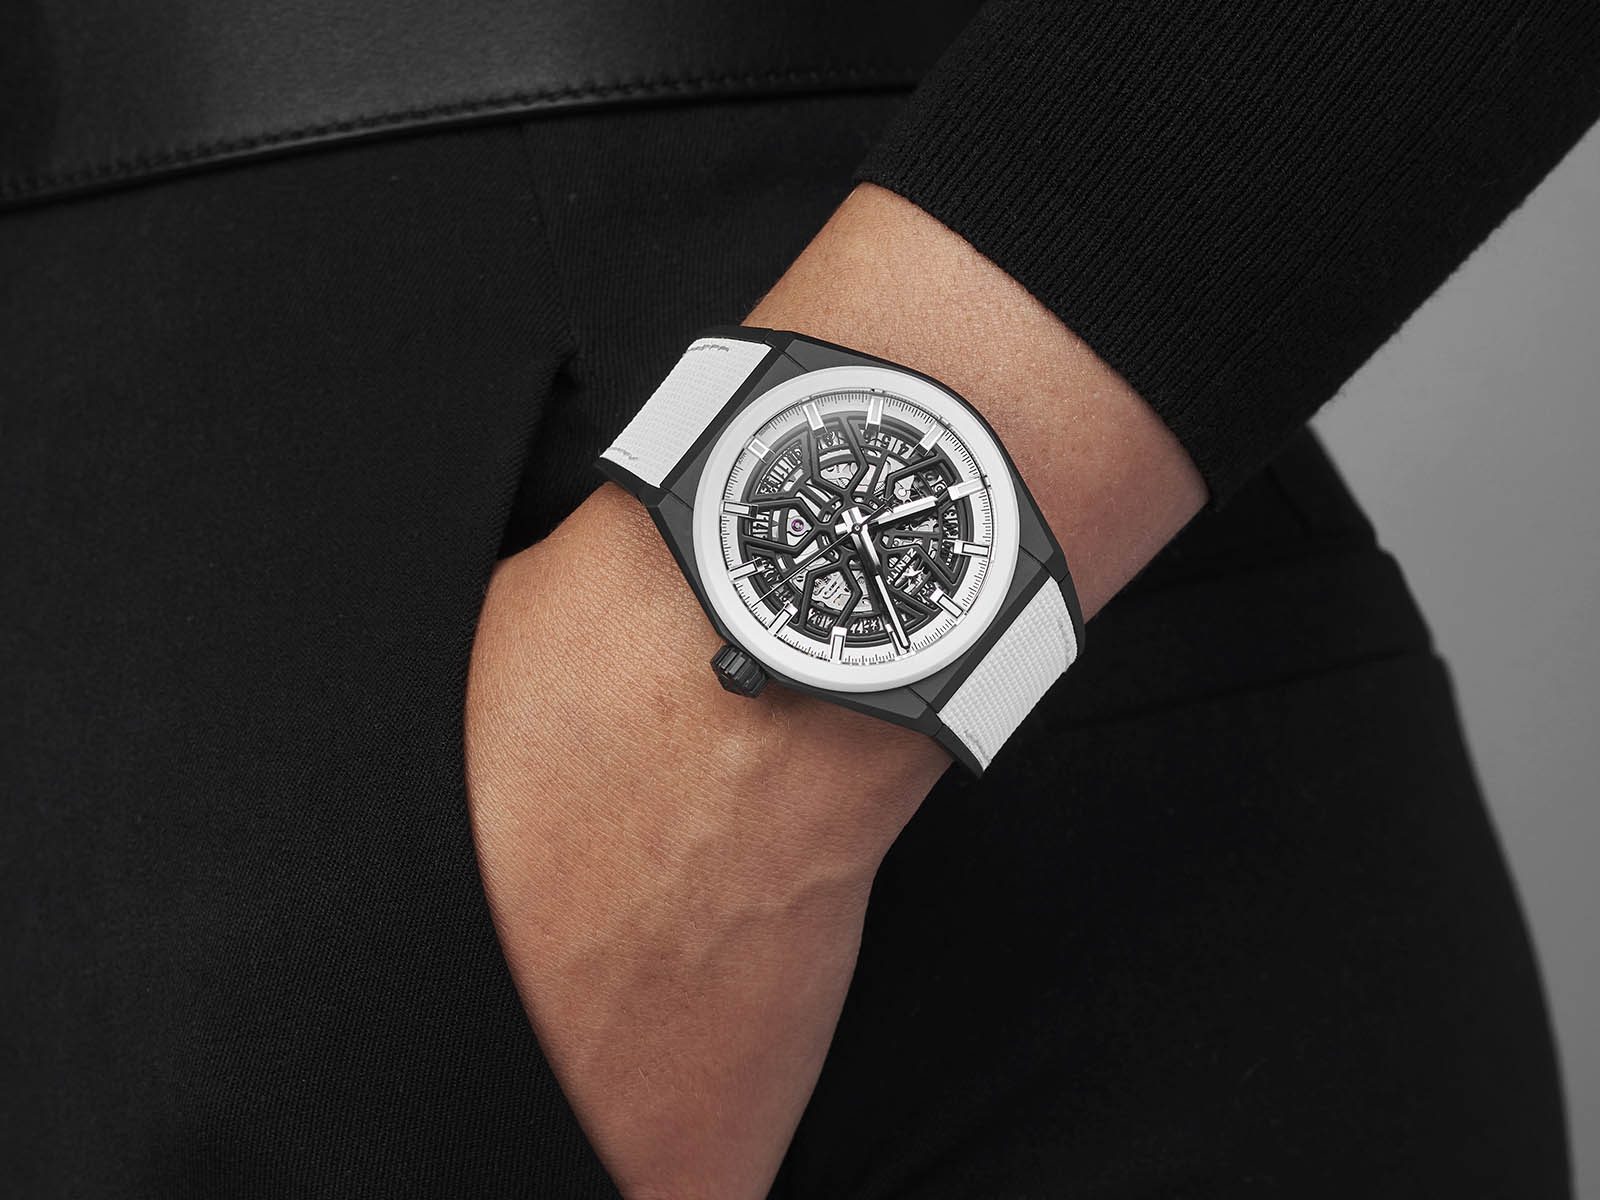 49-9005-670-11-r943-zenith-defy-classic-black-white-edition-2.jpg